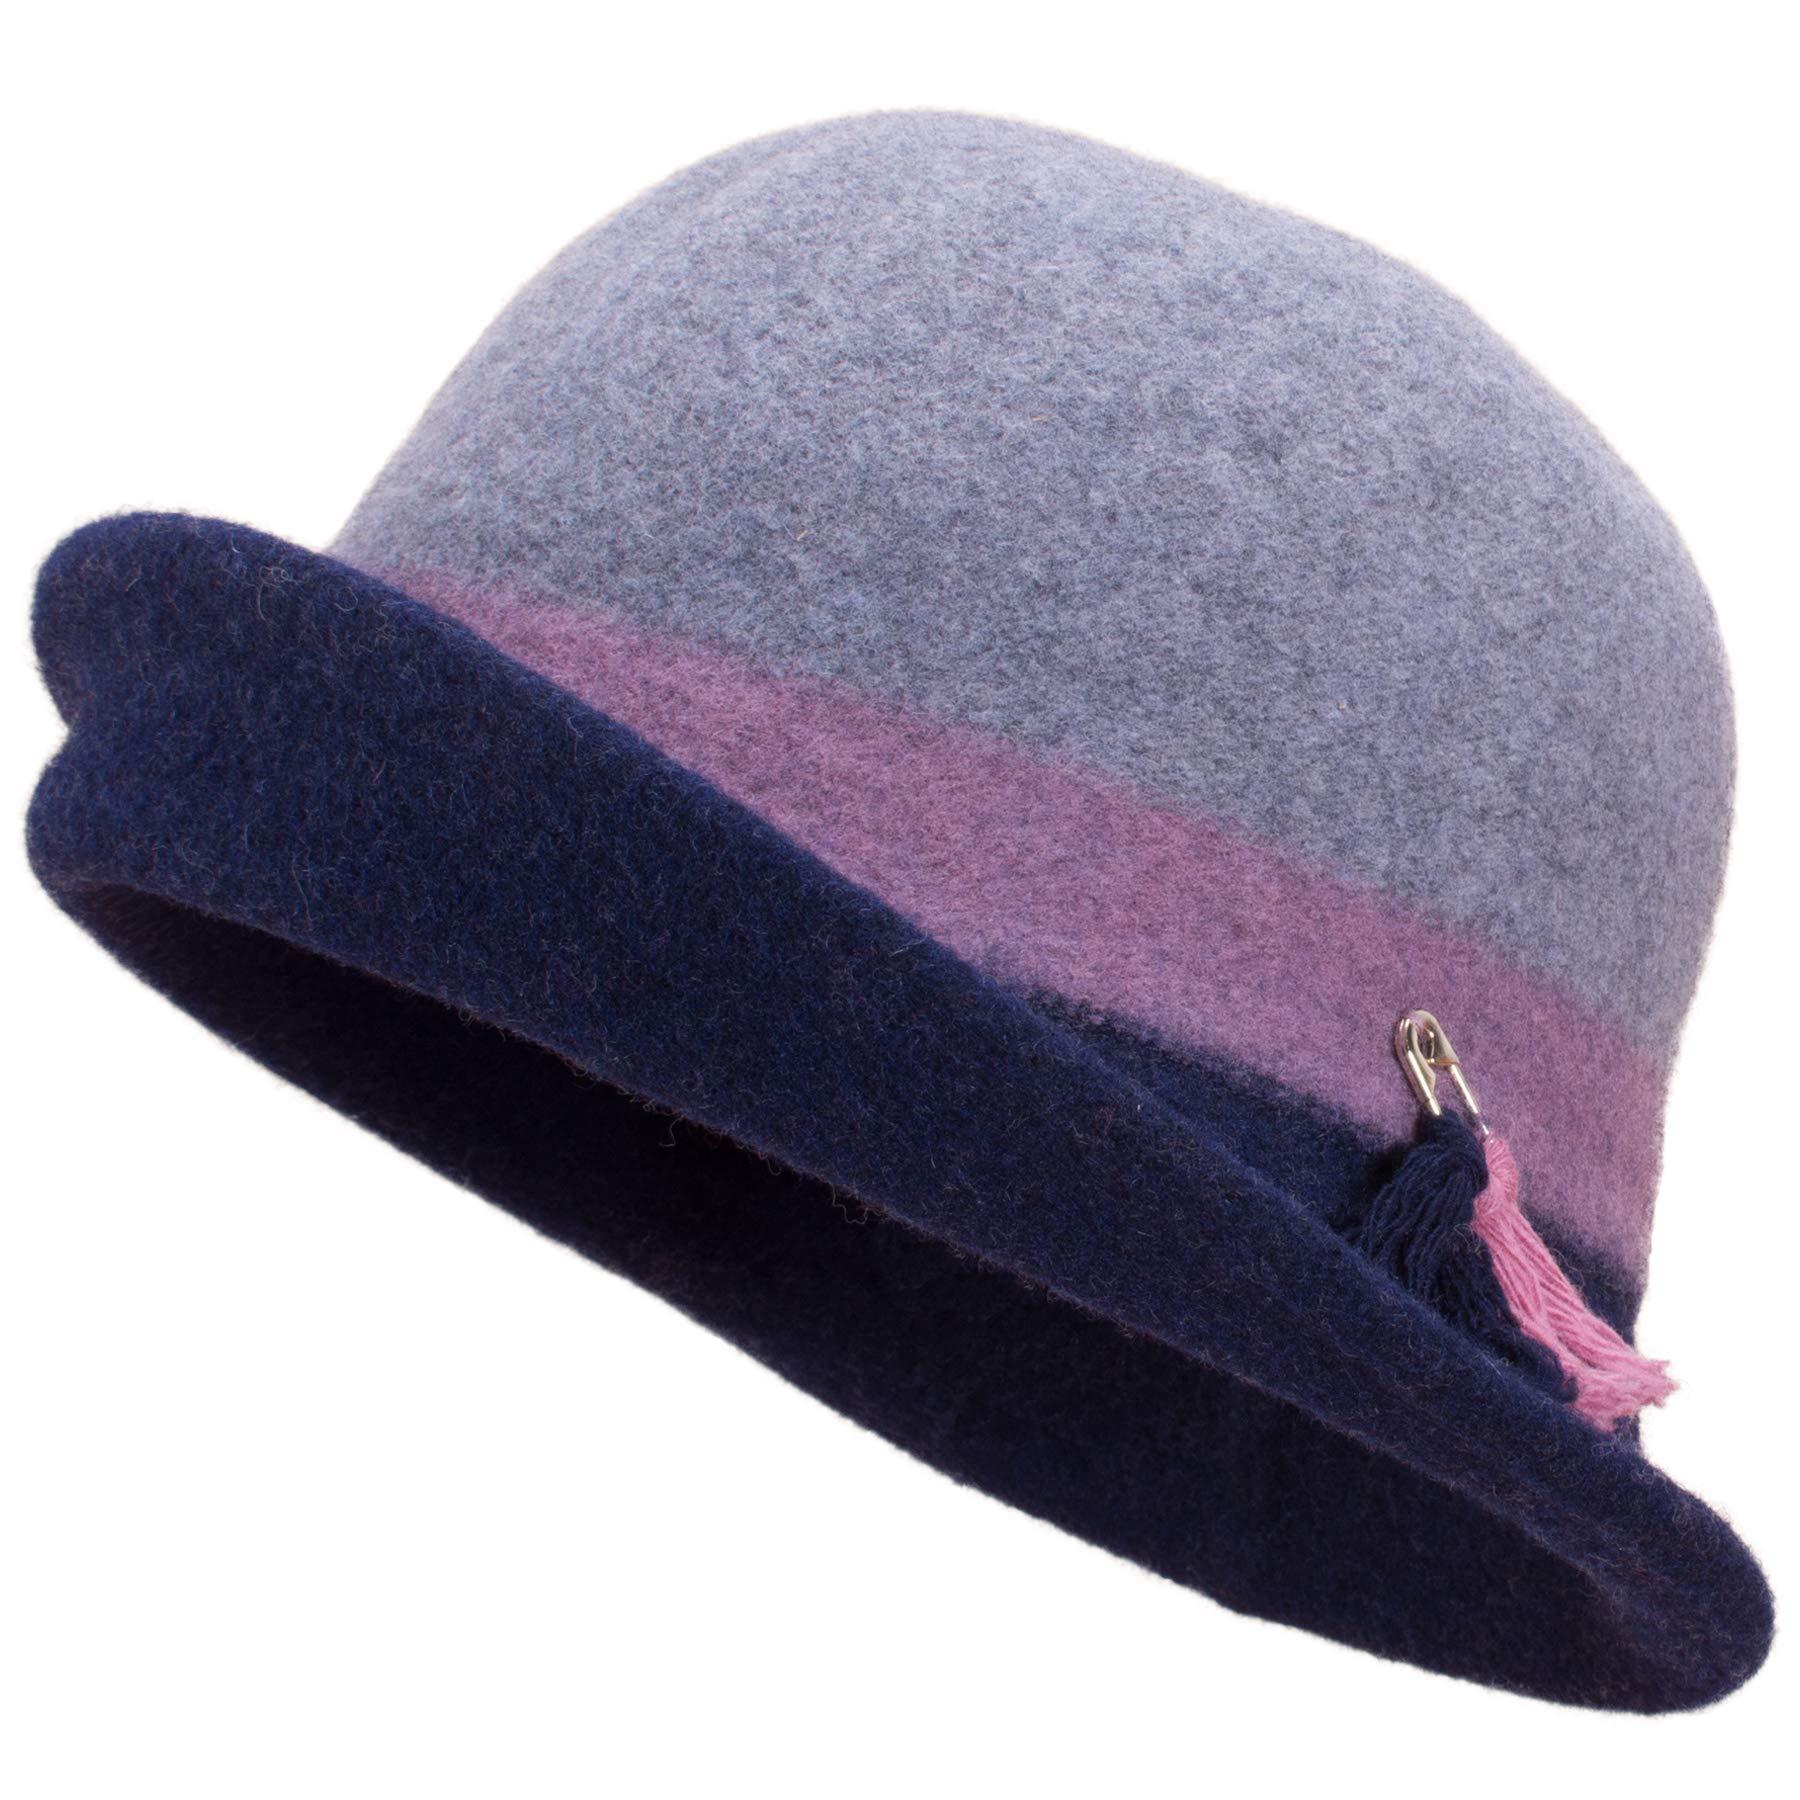 Lawliet Womens Vintage Style Upturn Brim Cloche Wool Soft Bucket Winter Hat A499 (Gray)